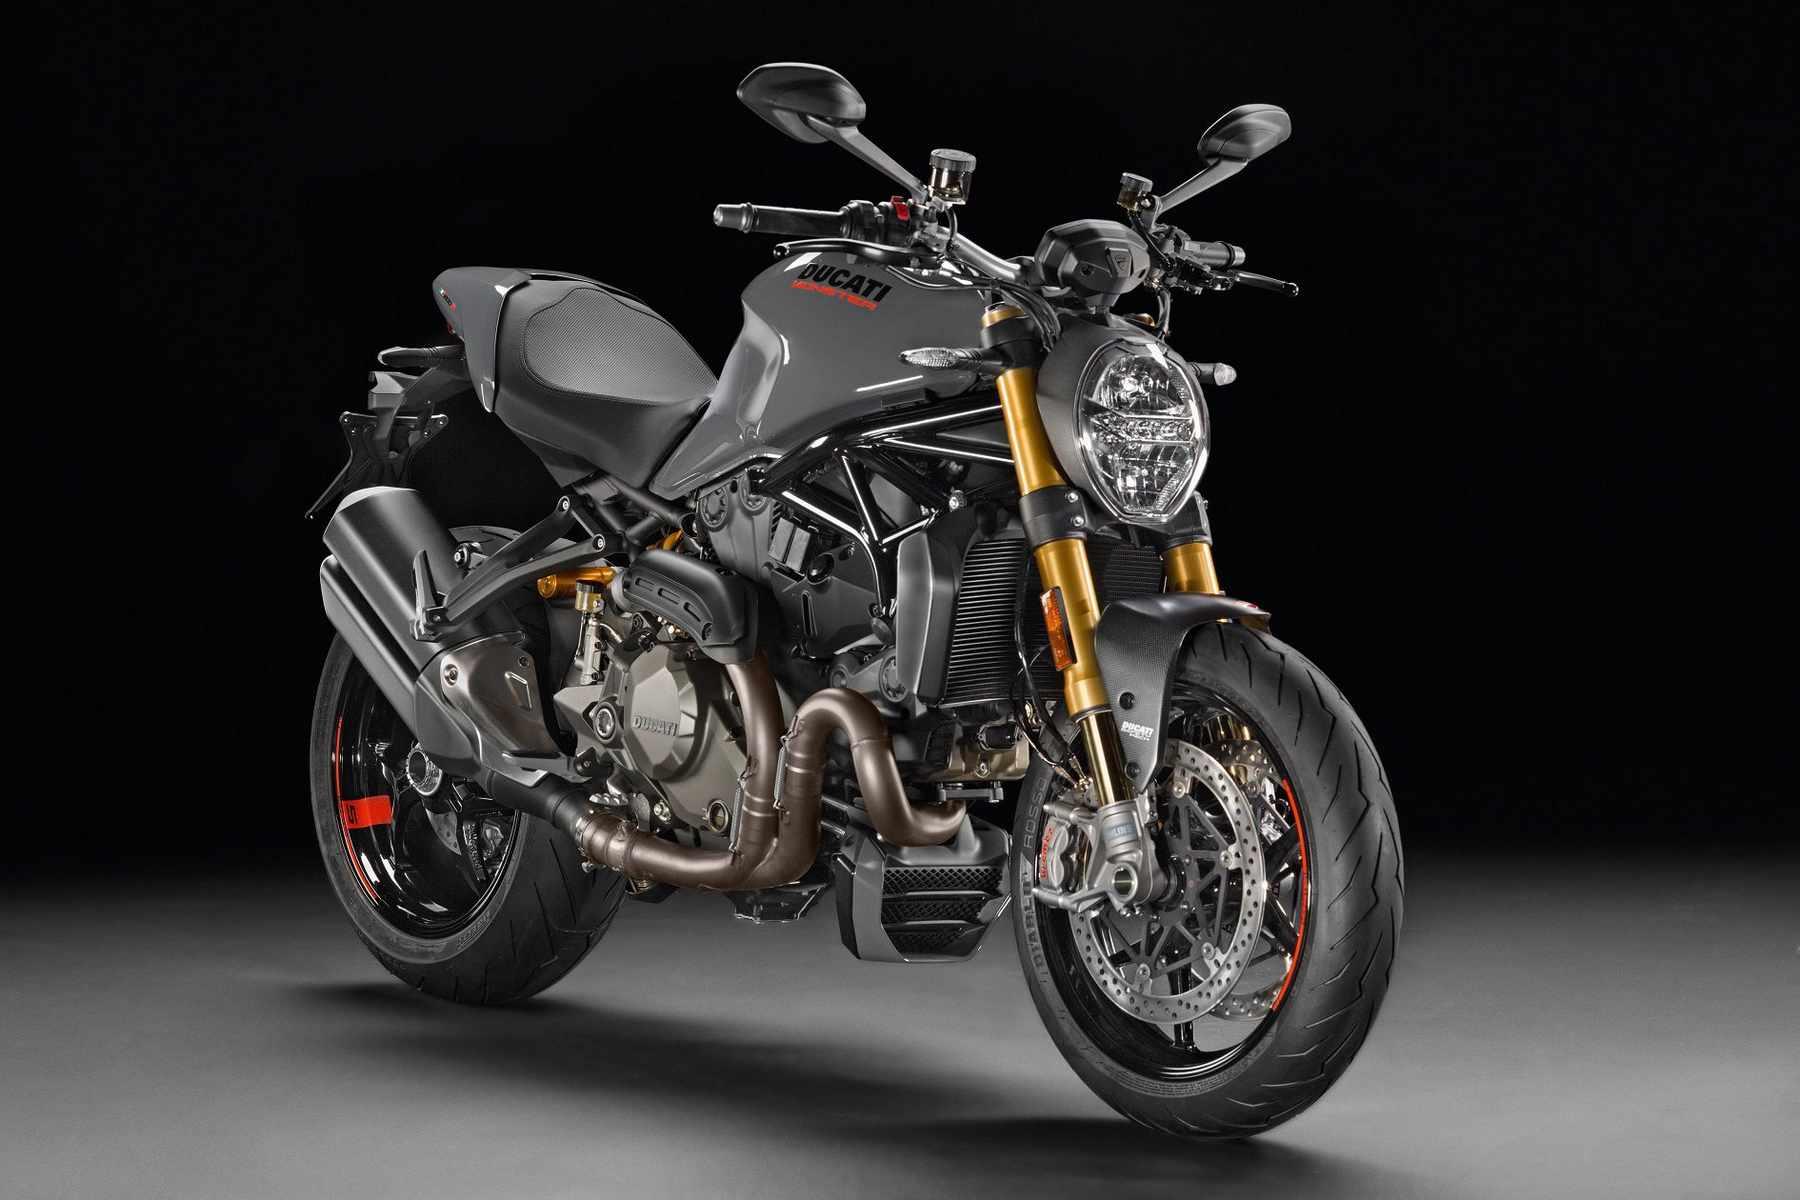 Nueva Ducati Monster 1200 / S 2018